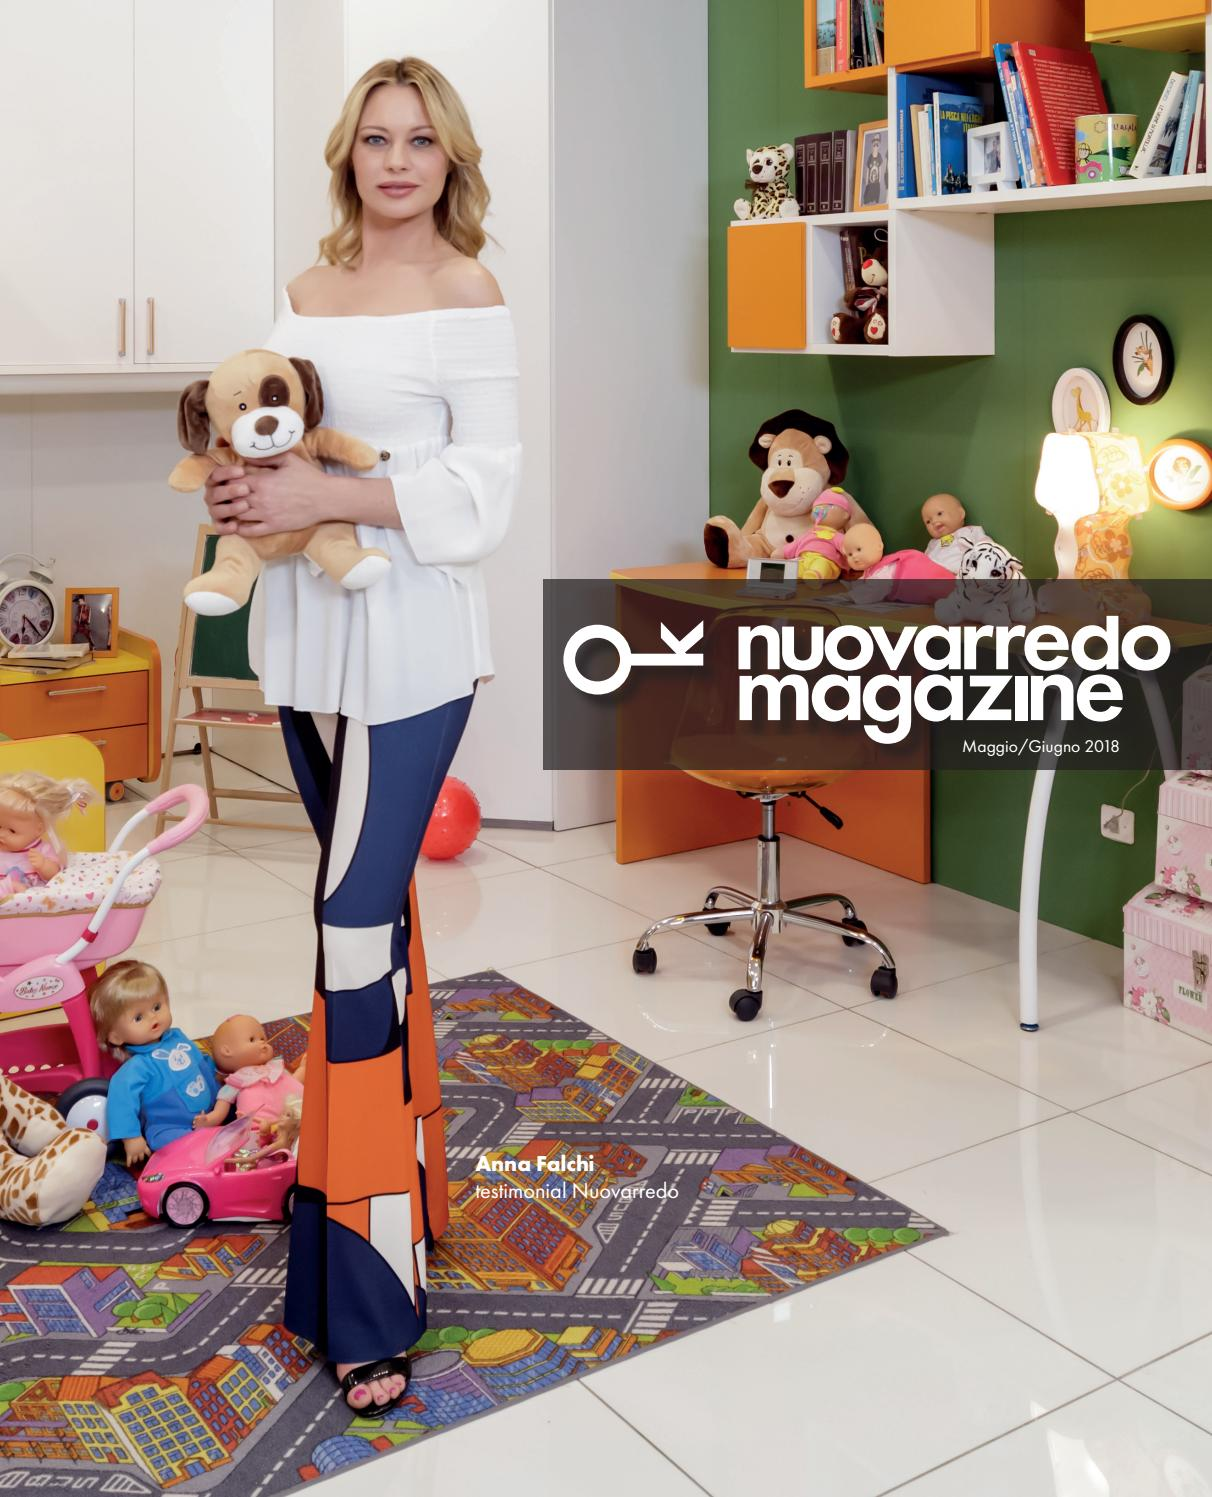 Nuovo Arredo A Taranto.Nuovarredo Magazine Maggio 2018 By Nuovarredo Issuu